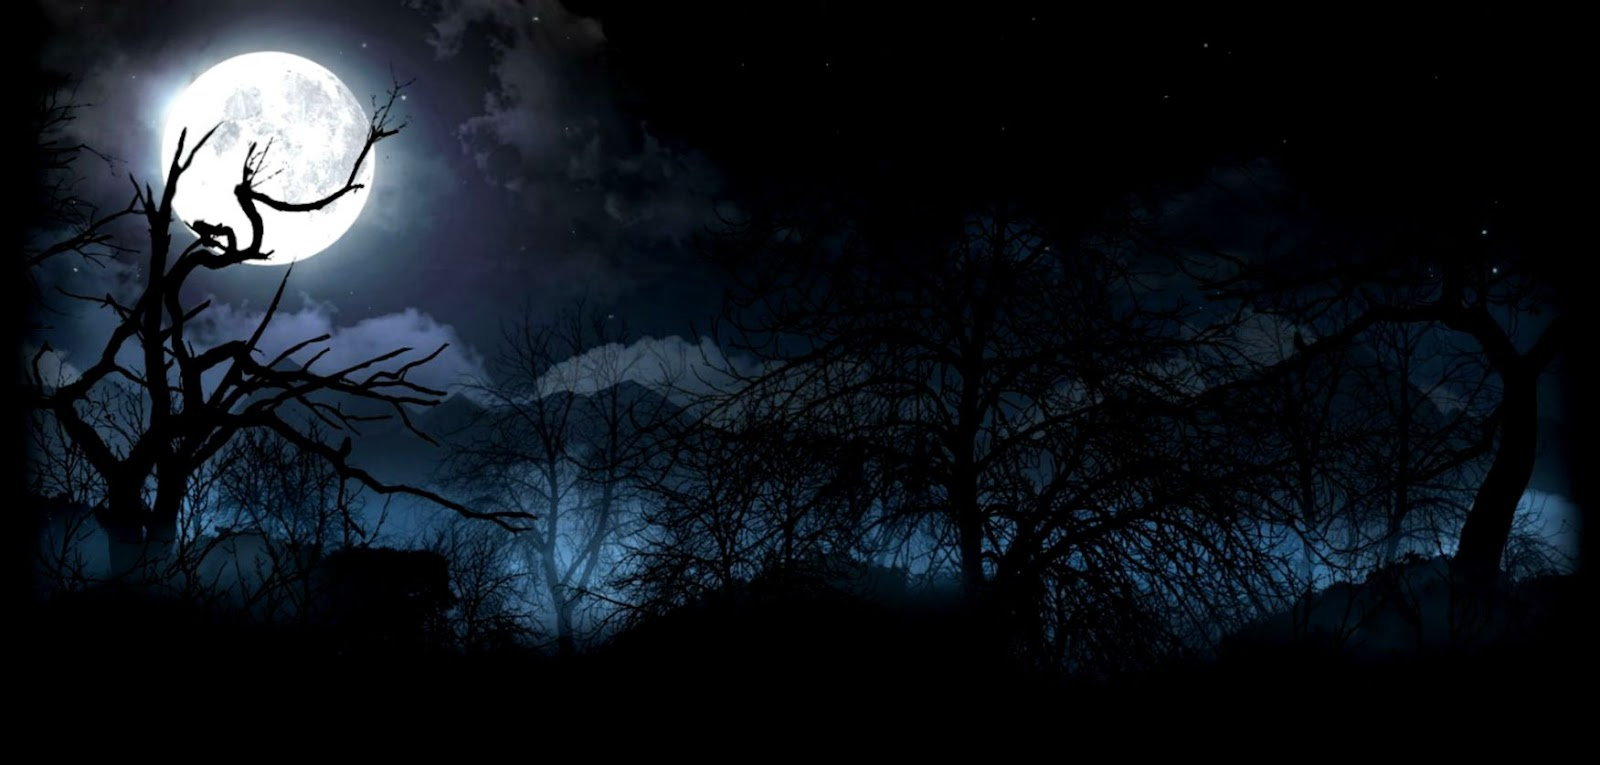 BITEFIGHT fantasy dark  vampire werewolf monster online mmo